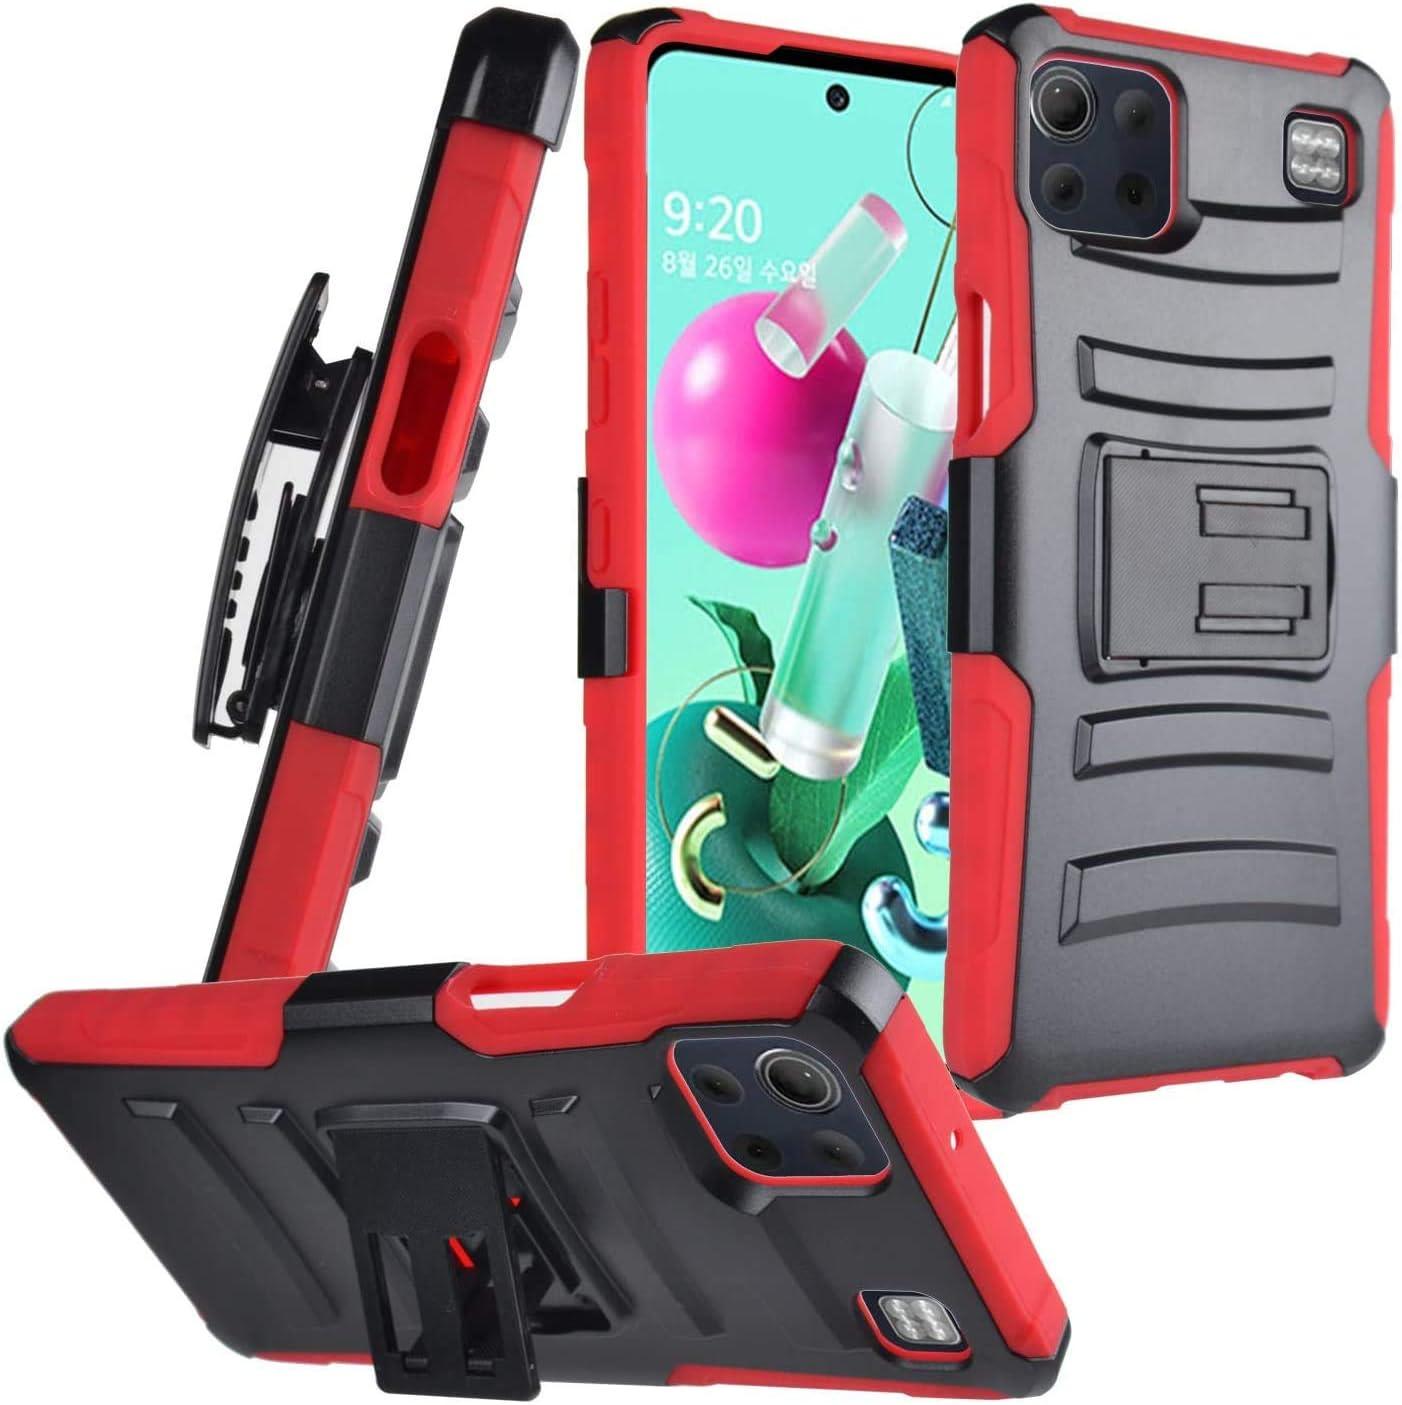 AmeriCase - [ LG K92 5G ] Hybrid Defender Phone Case W/Belt Clip Holster (Red)